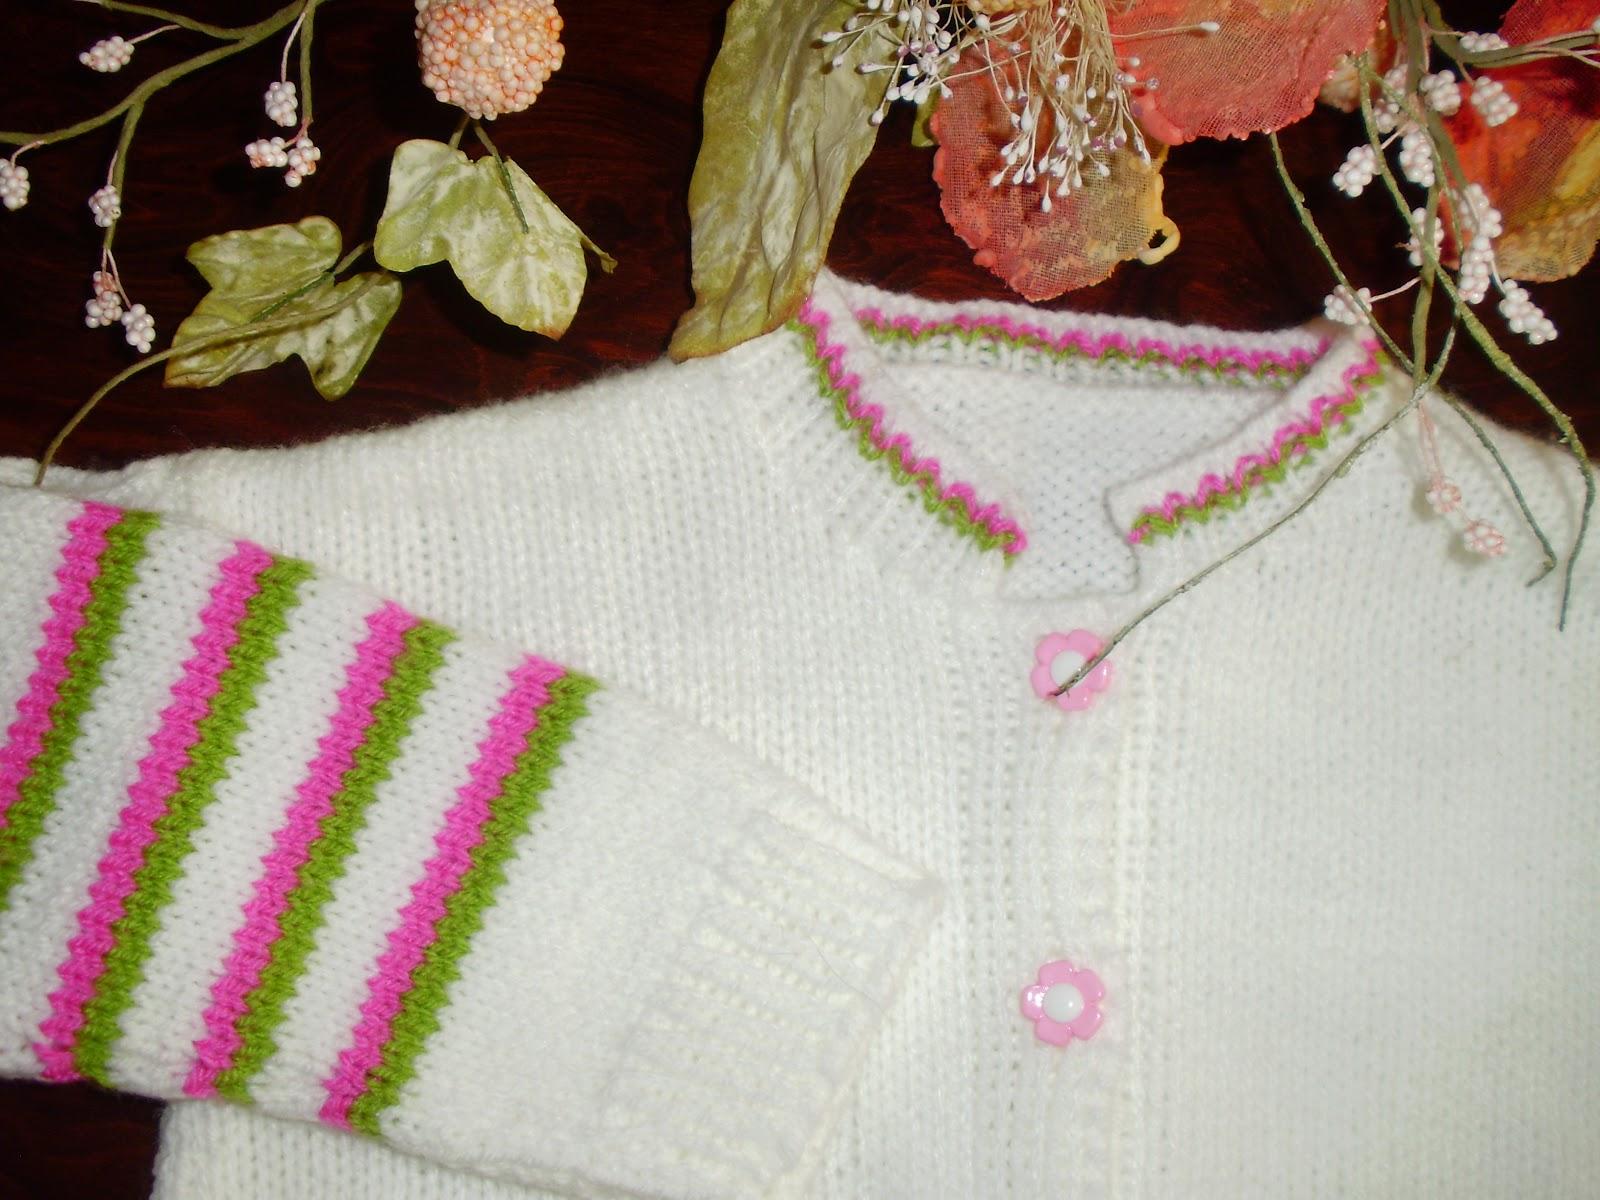 886c8c12f3f Victoria - Handmade Creations : Παιδικό πλεκτό ζακετάκι